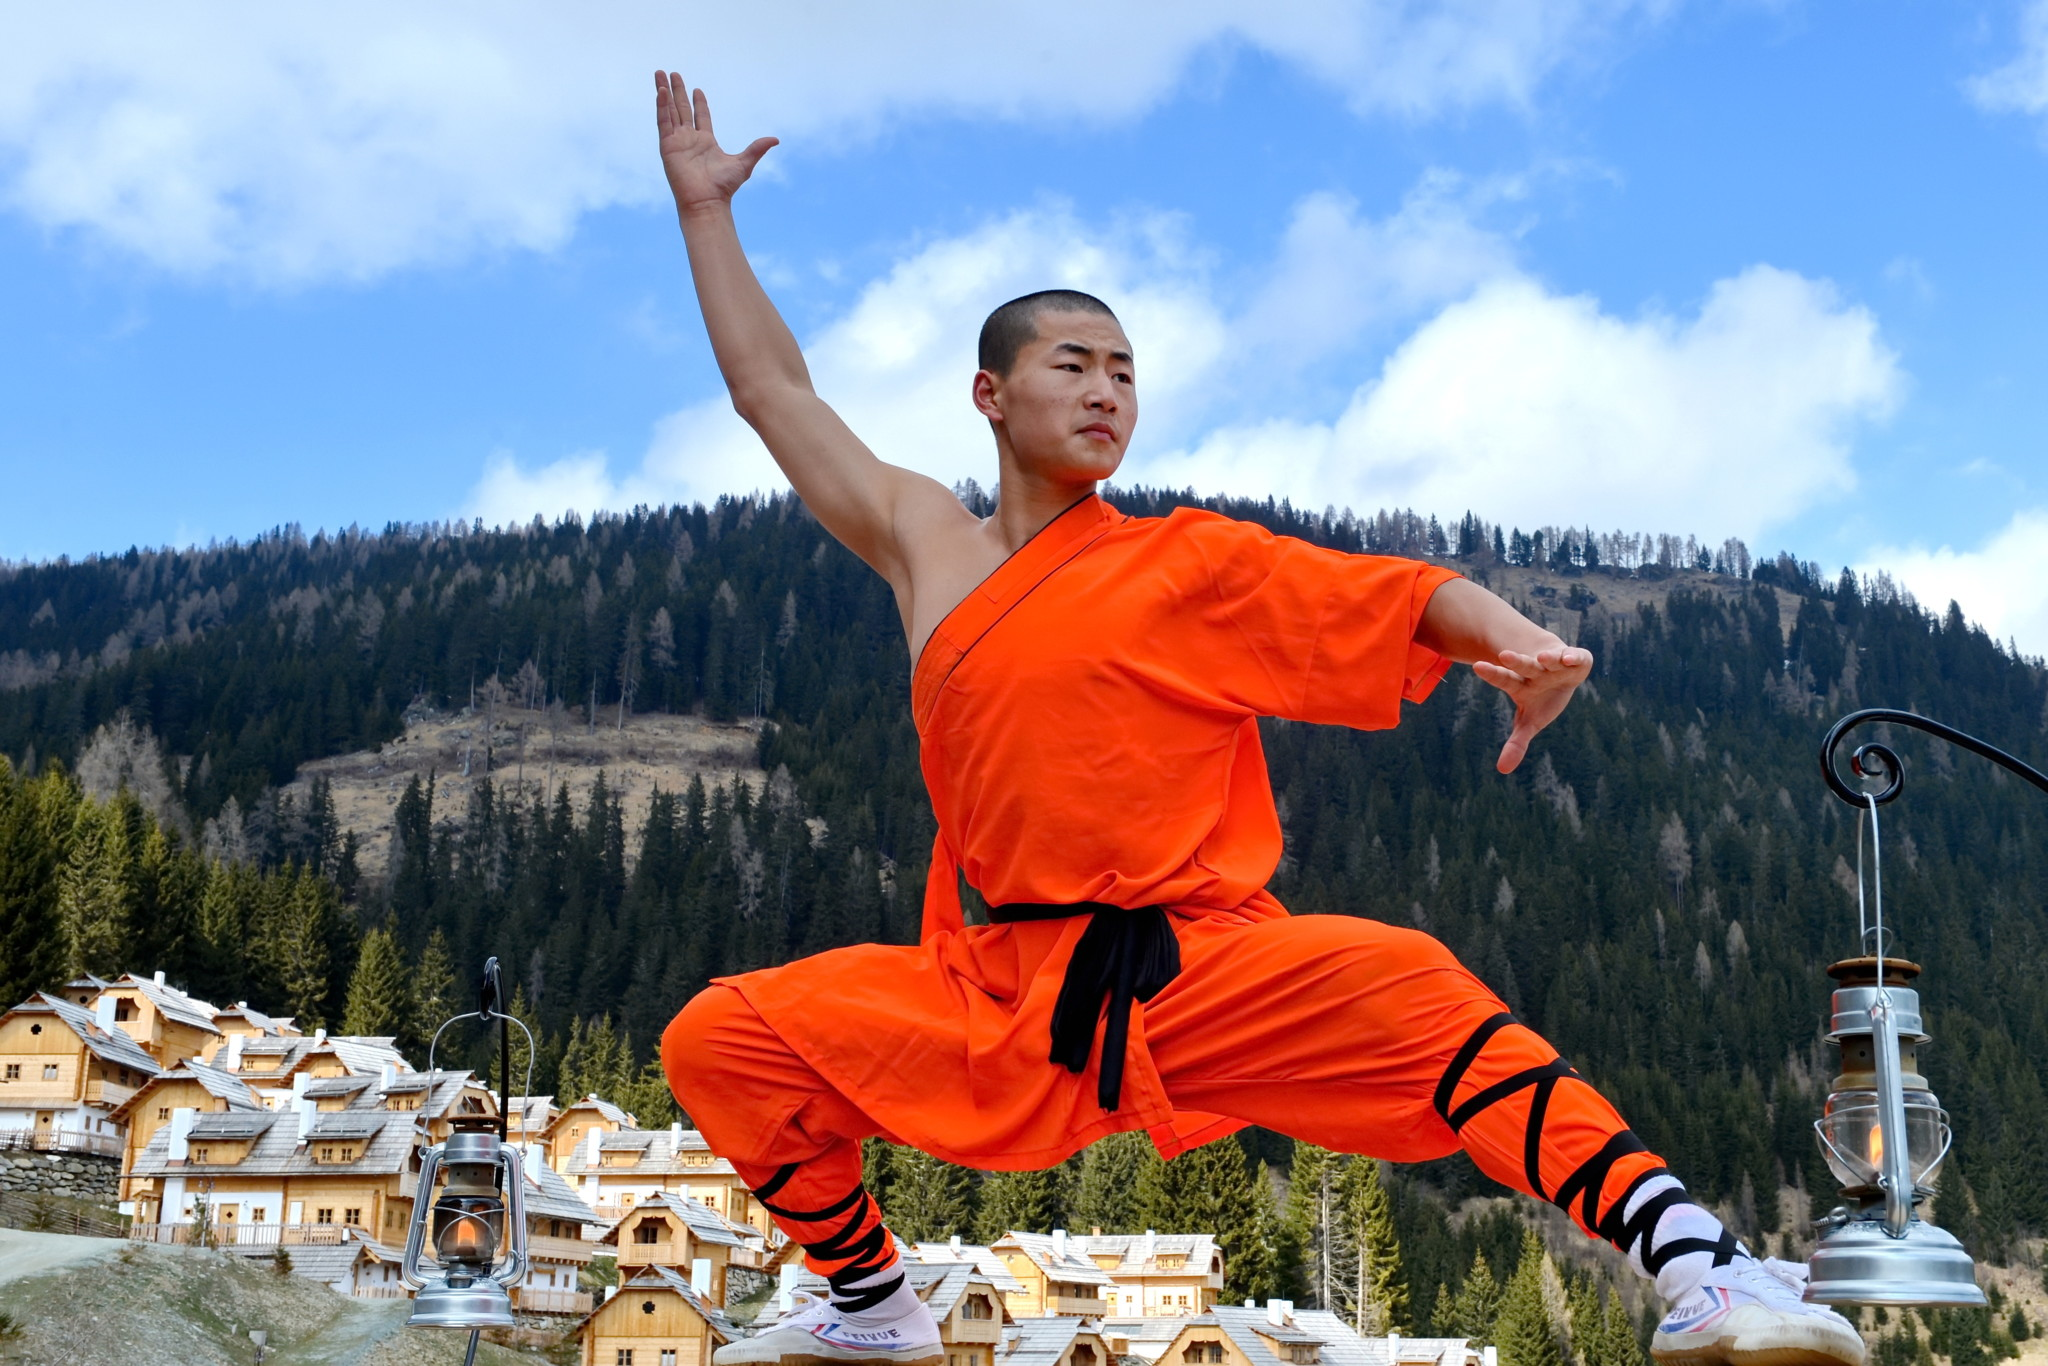 Shaolin Moenche_0195_1